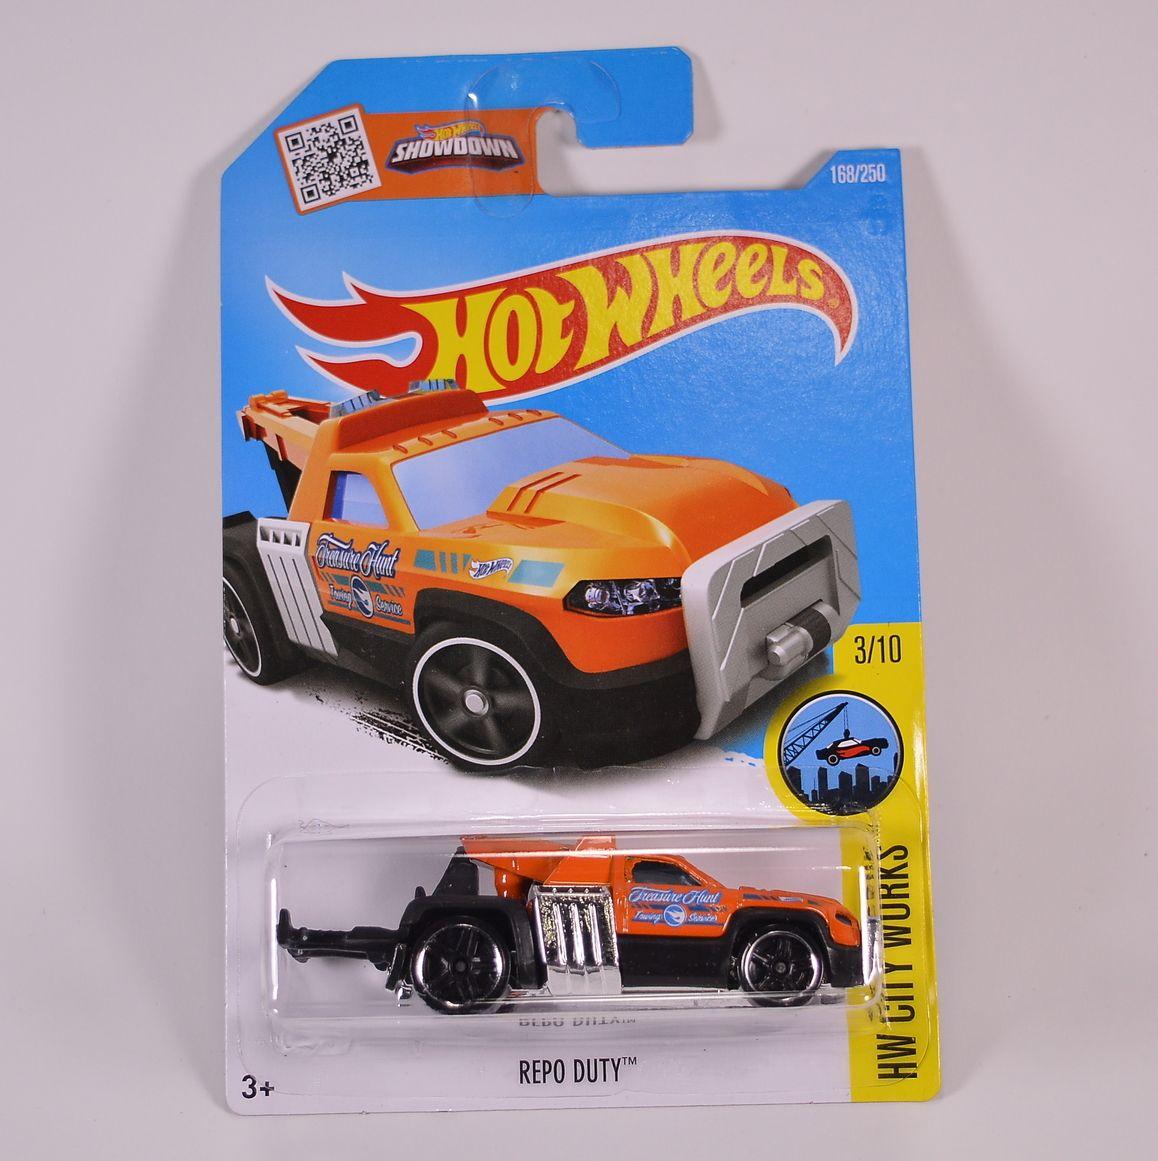 Hot Wheels Repo Duty Hot Wheels Kids Hot Wheels Hot Wheels Display Case [ 1161 x 1158 Pixel ]